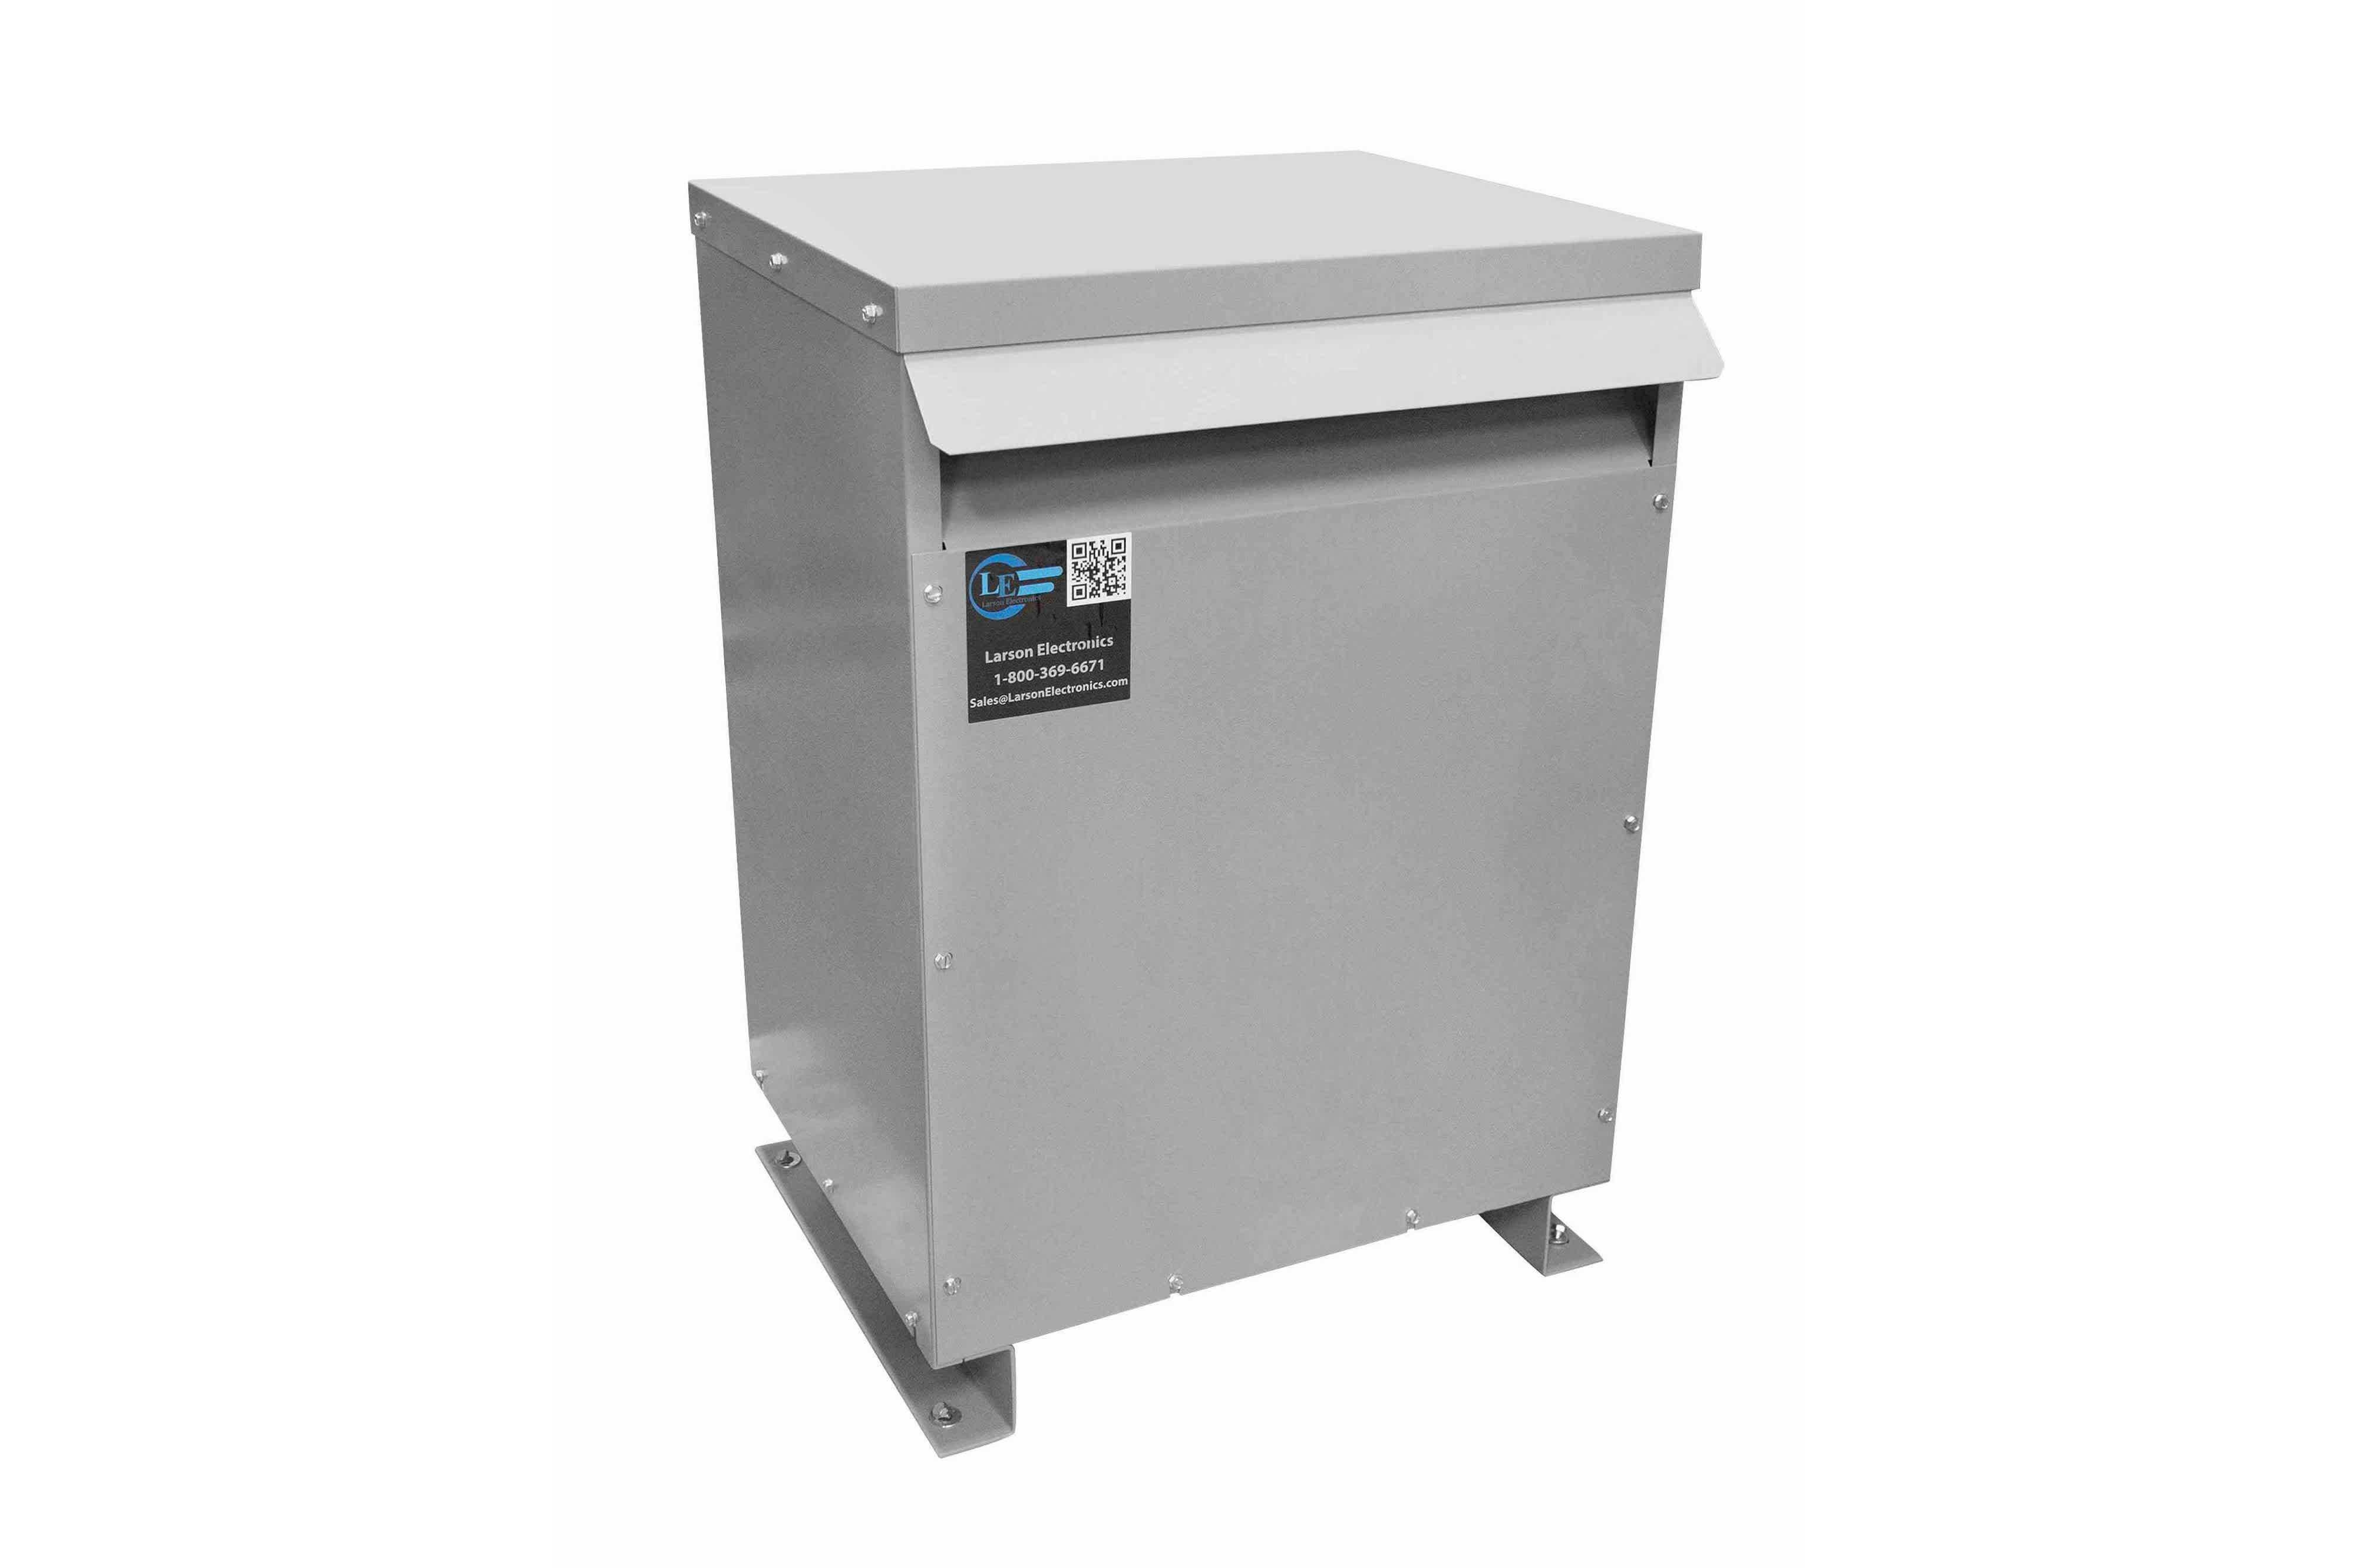 115 kVA 3PH Isolation Transformer, 400V Wye Primary, 600Y/347 Wye-N Secondary, N3R, Ventilated, 60 Hz